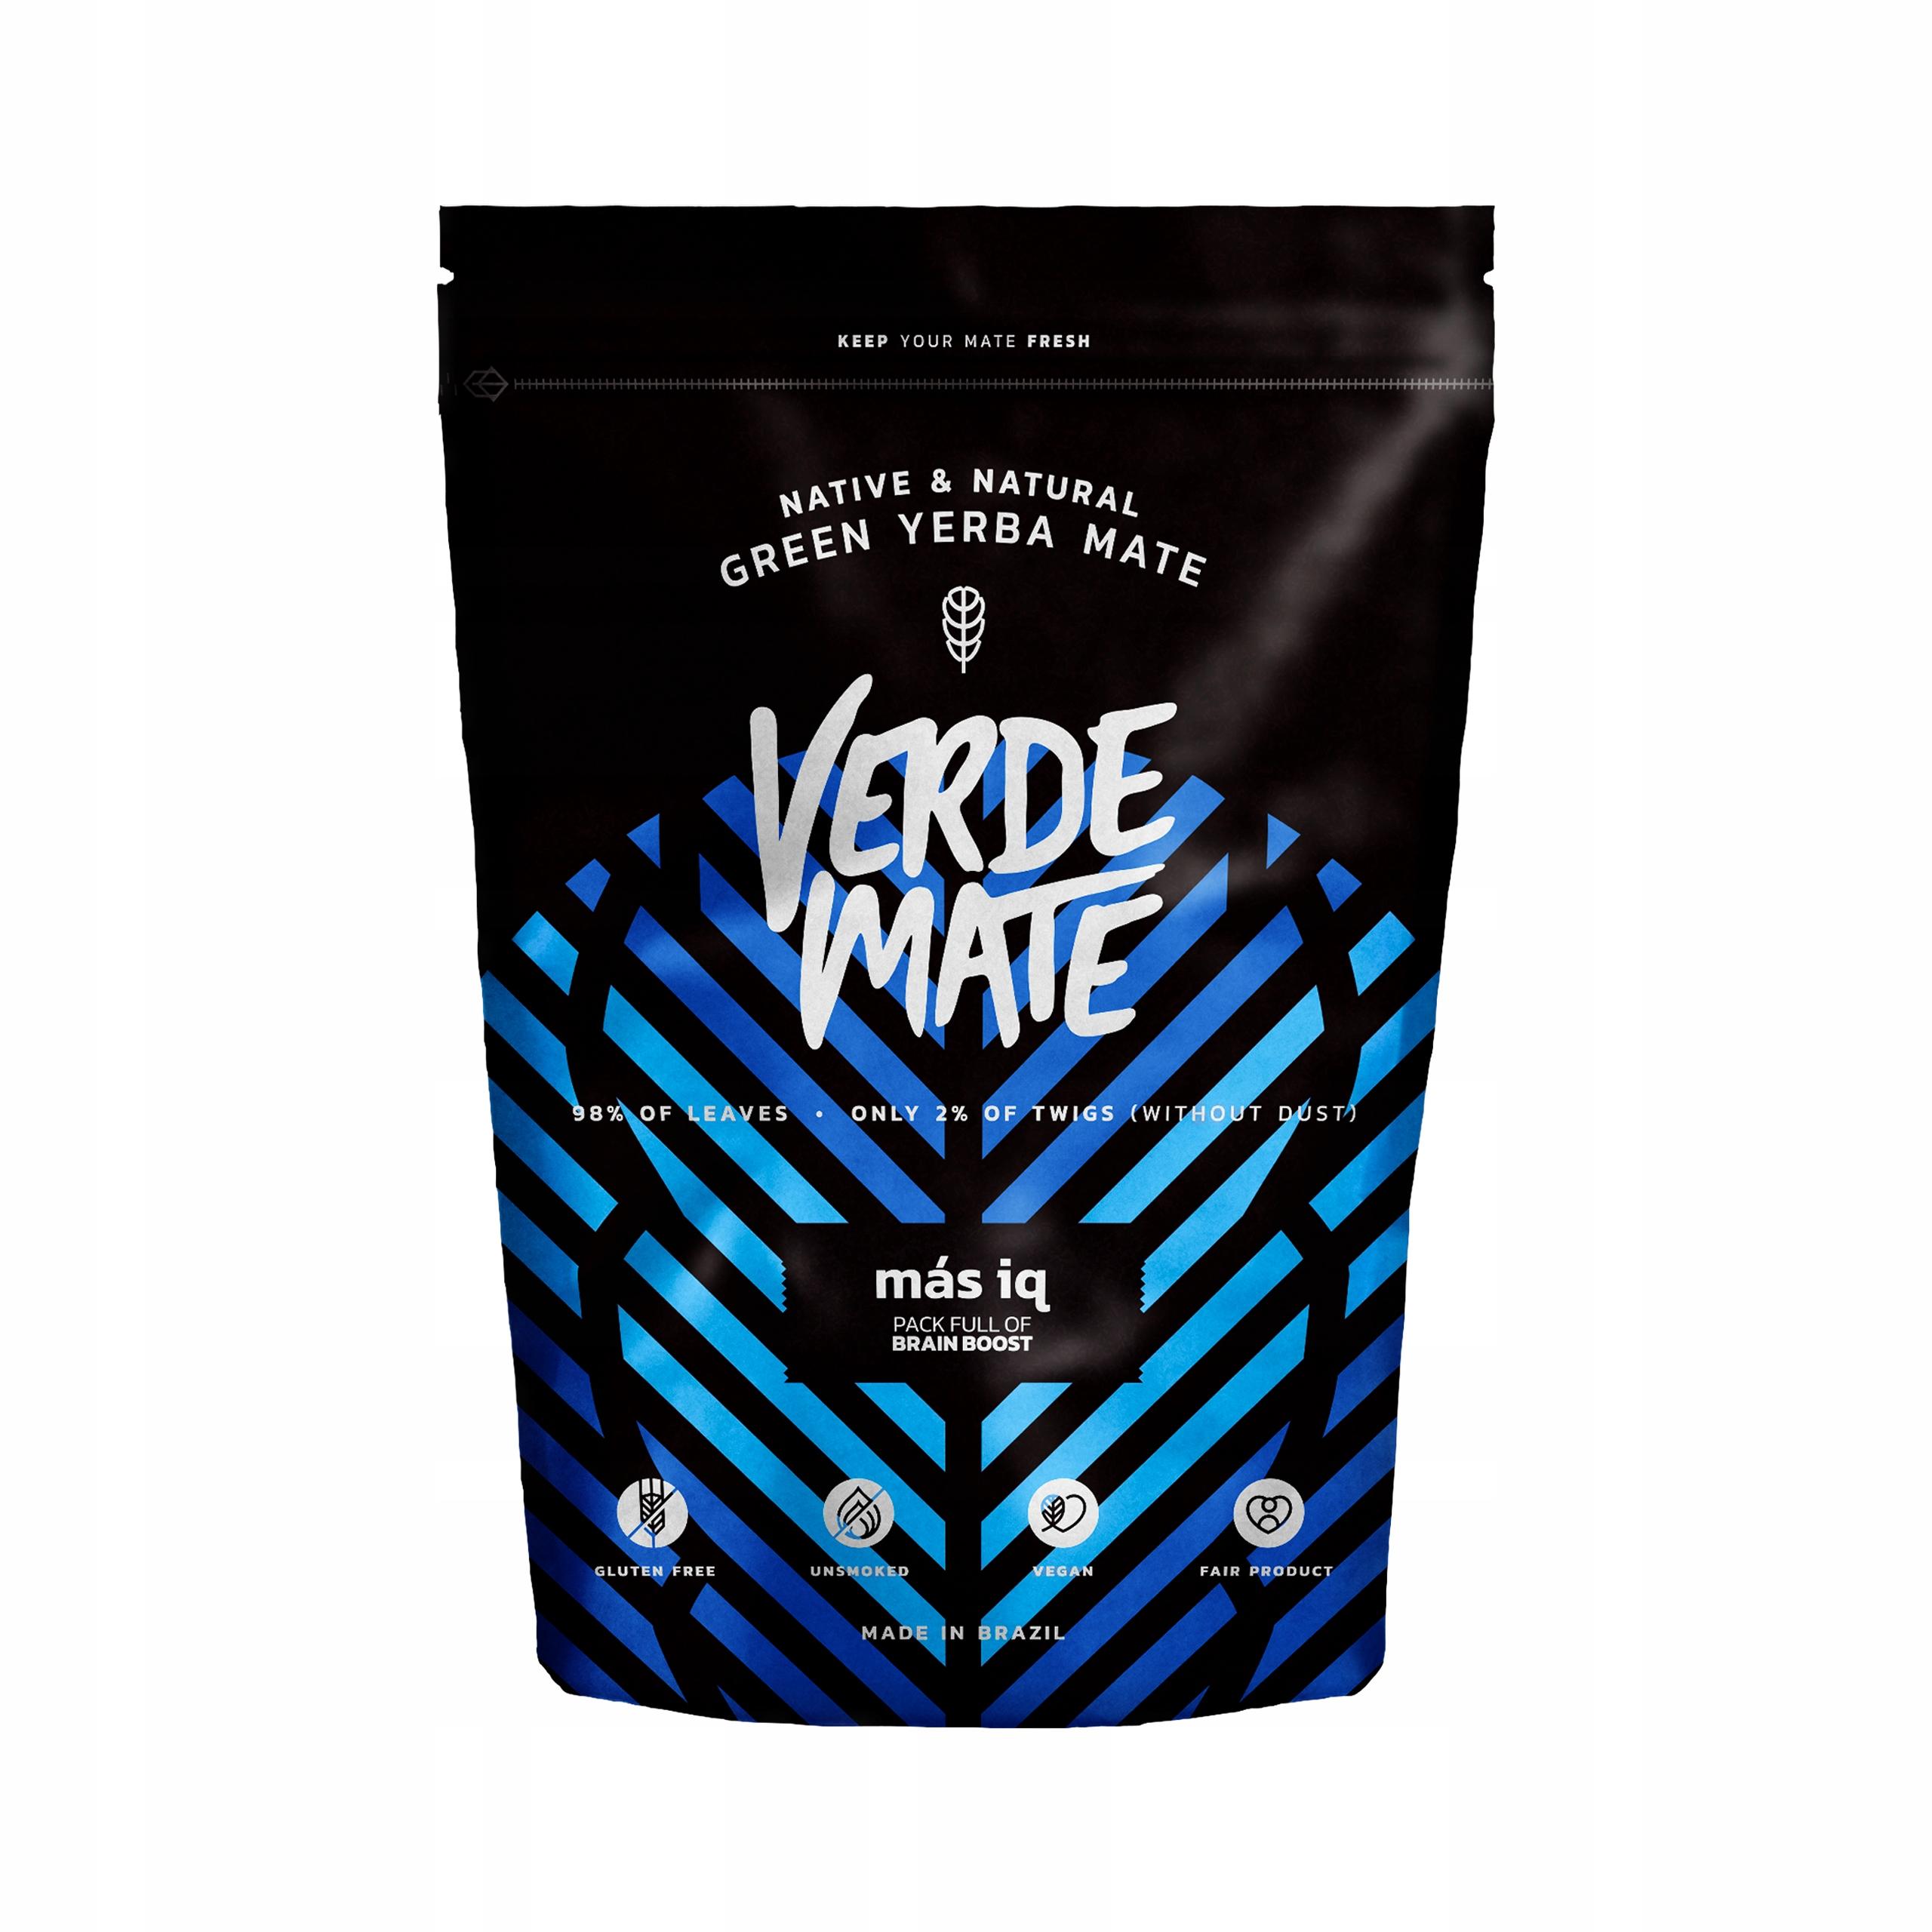 Yerba Mate green Verde Mate Масс IQ Ноль ,5 кг 500 г